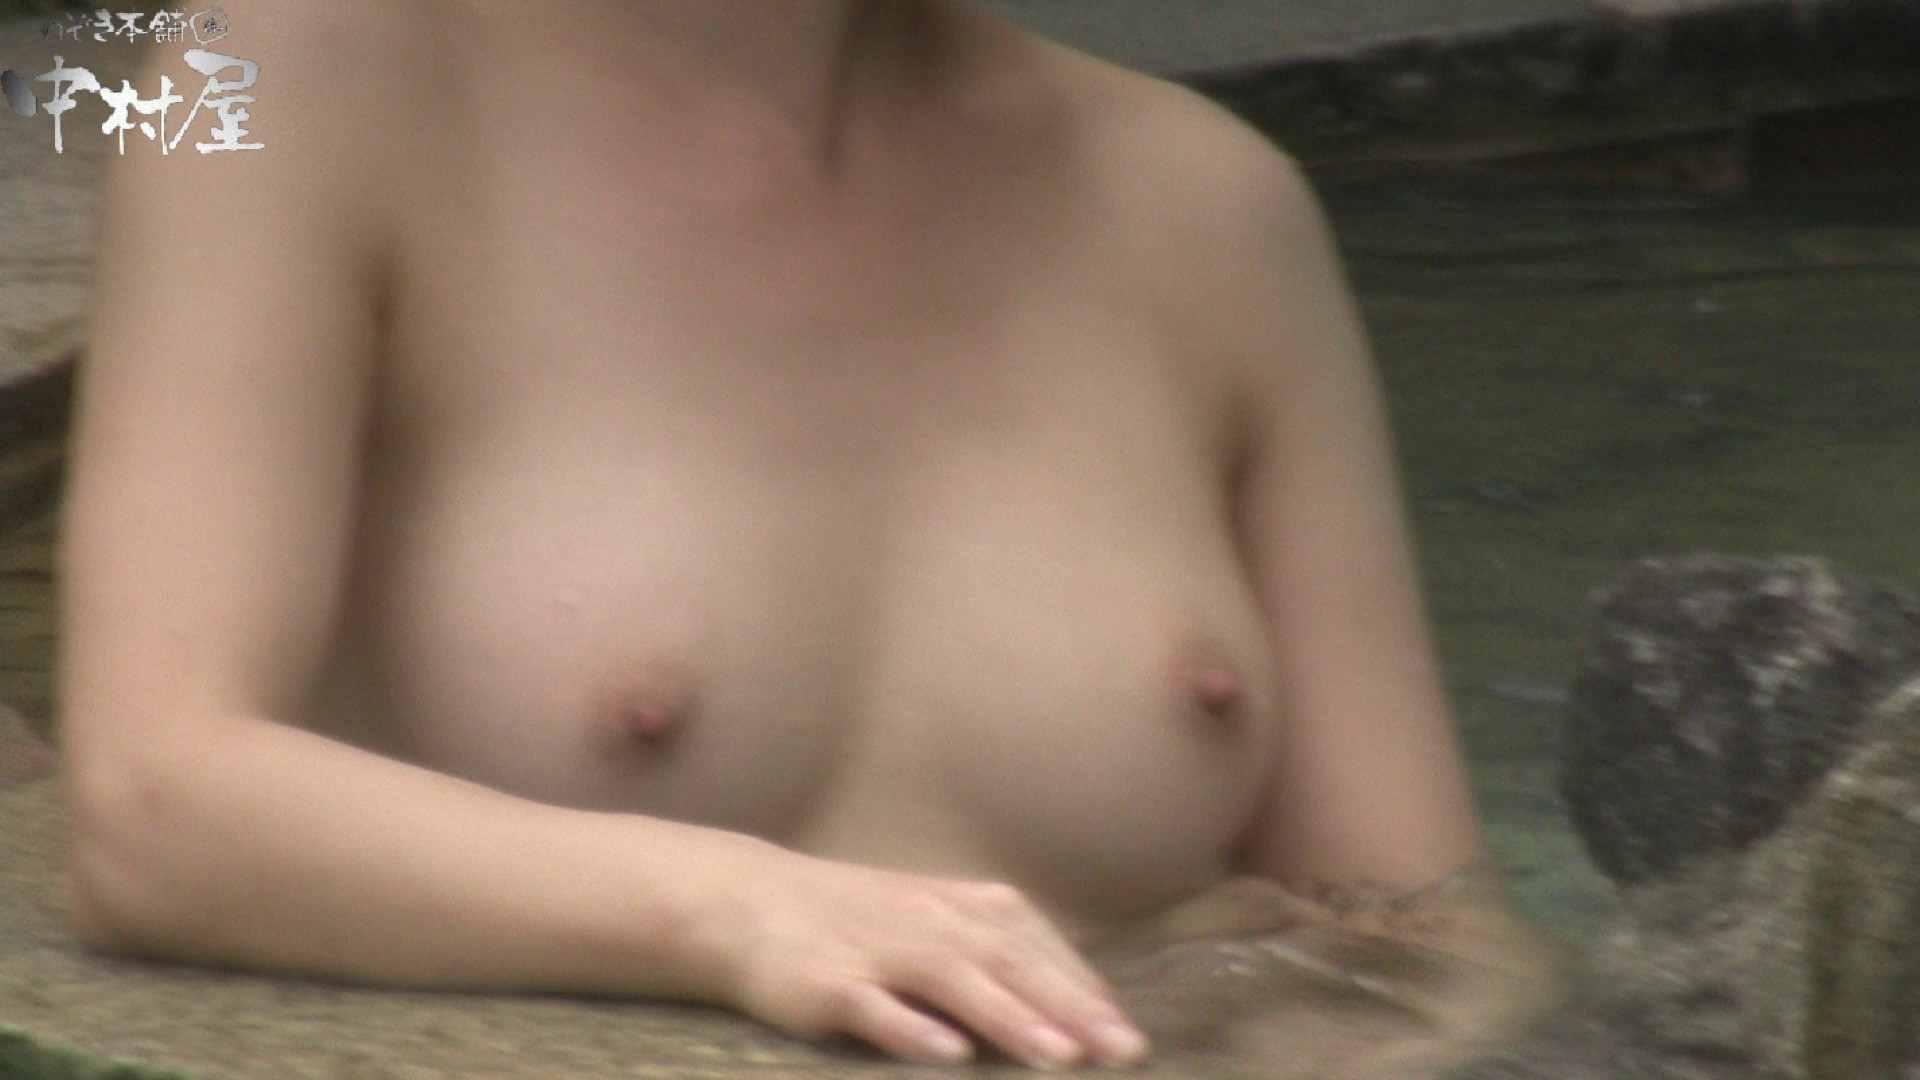 Aquaな露天風呂Vol.905 盗撮   OLエロ画像  67PICs 61